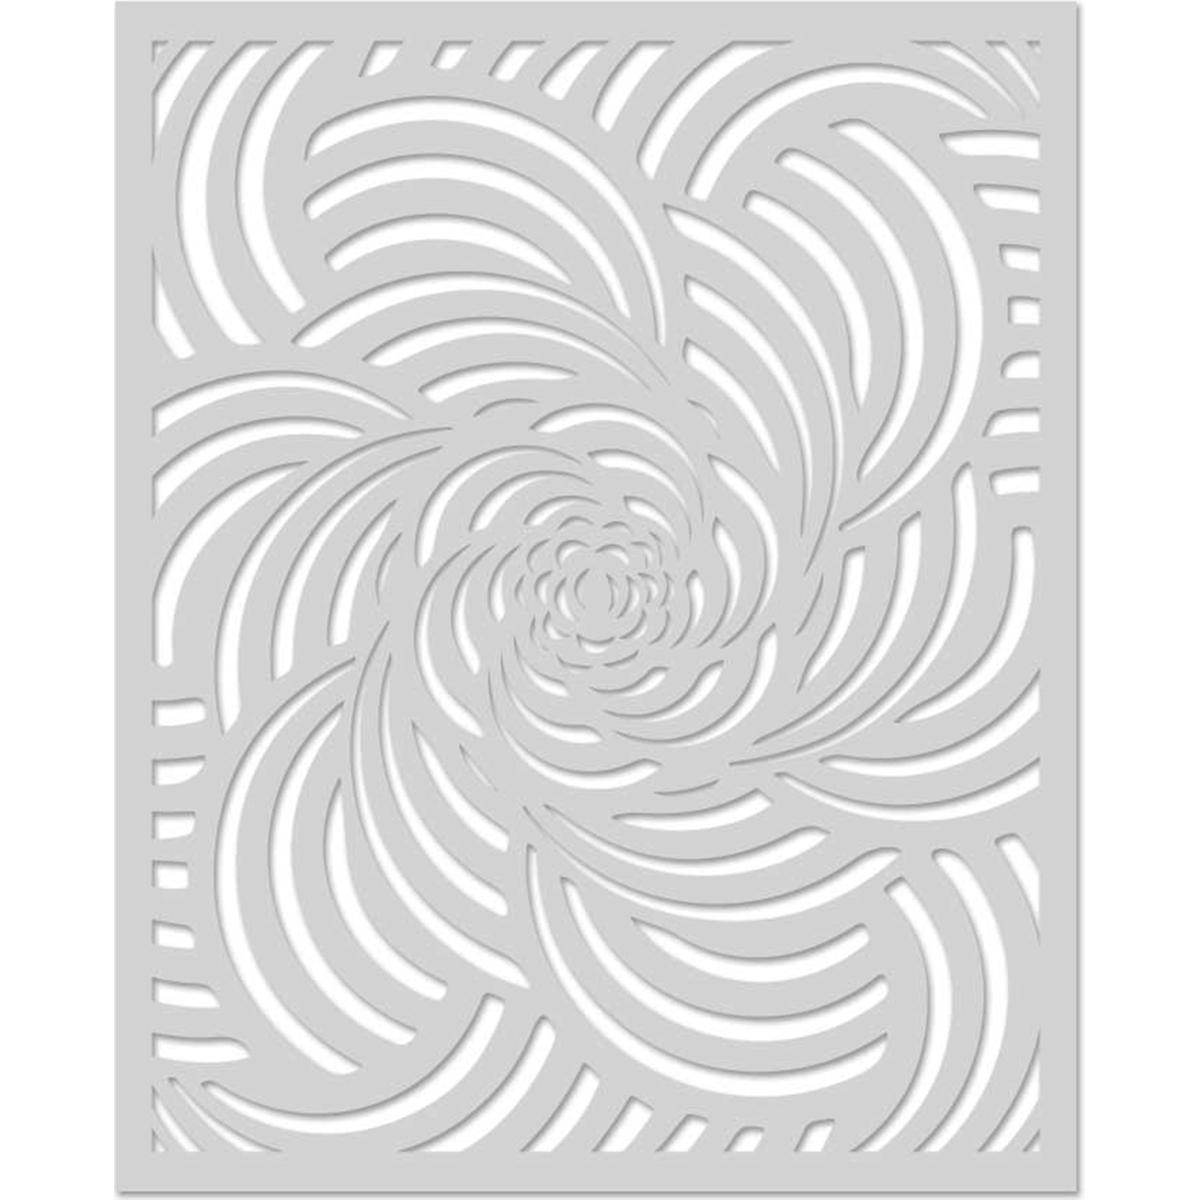 Hero Arts Stencil 6.25X5.25-Spiral Petals